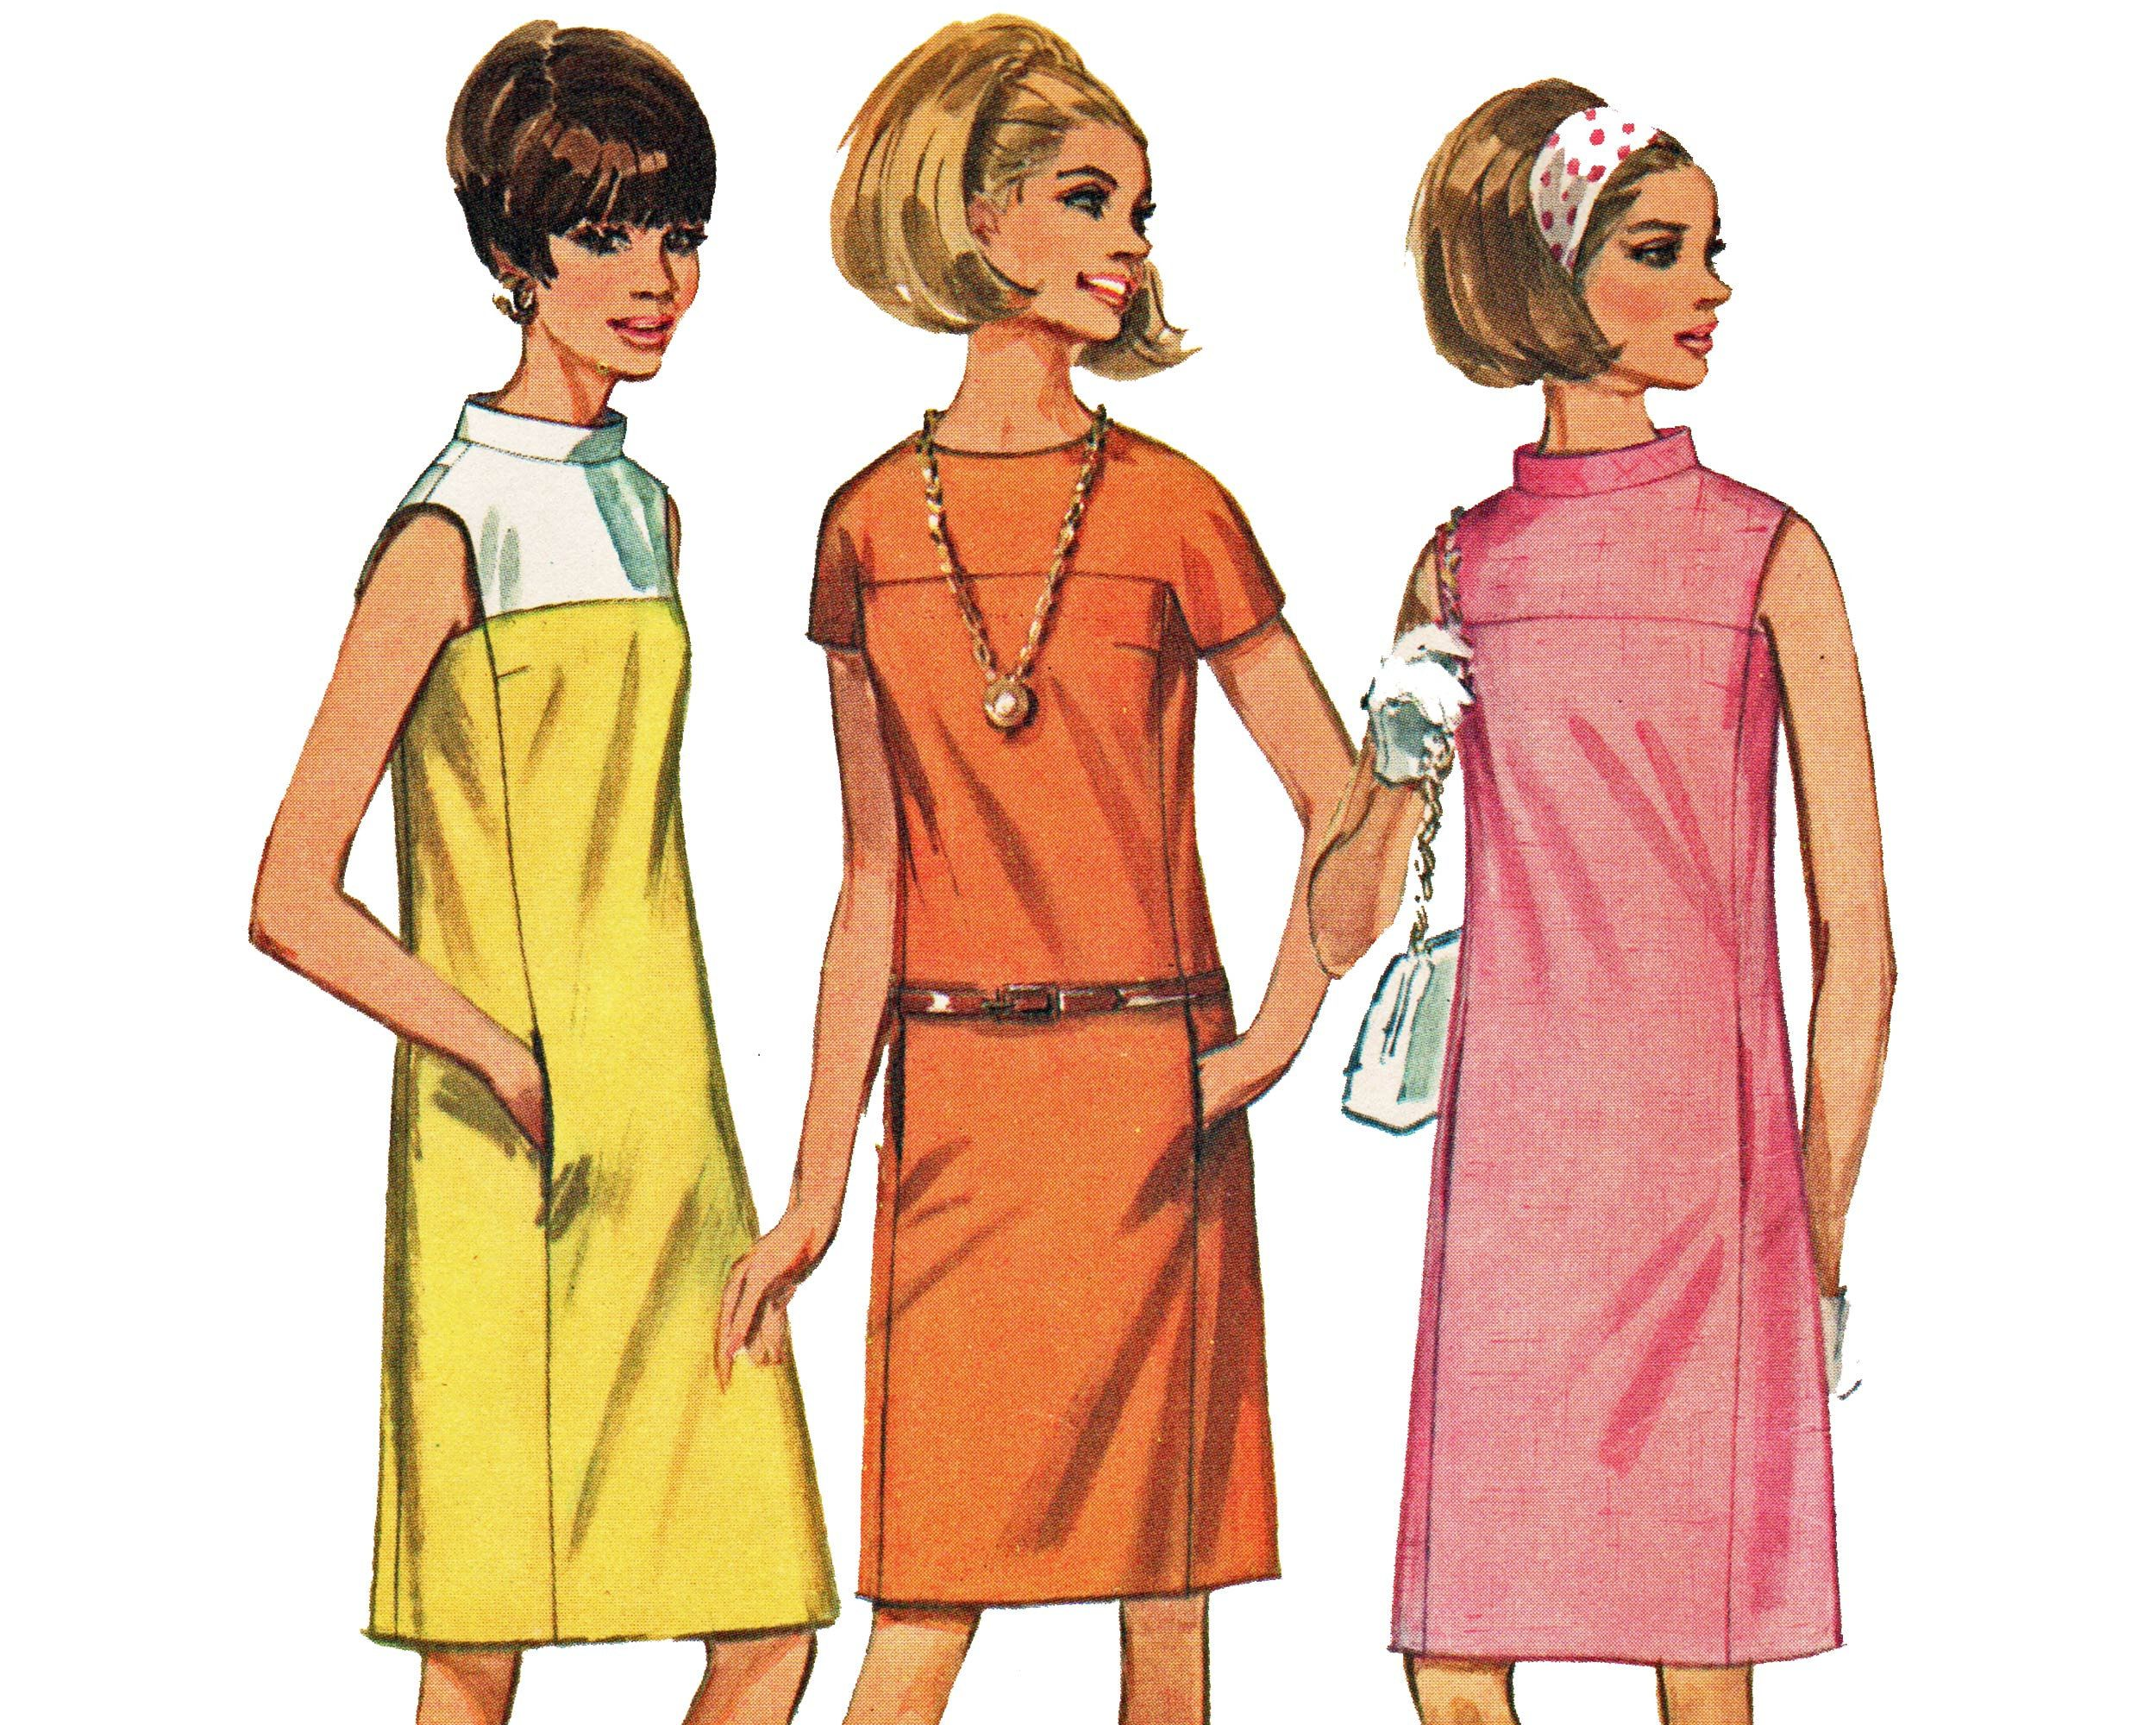 Sewing Pattern For 60s Shift Dress Sleeveless Or Short Etsy Shift Dress Pattern Maxi Dress Pattern Wrap Dress Pattern [ 2000 x 2500 Pixel ]